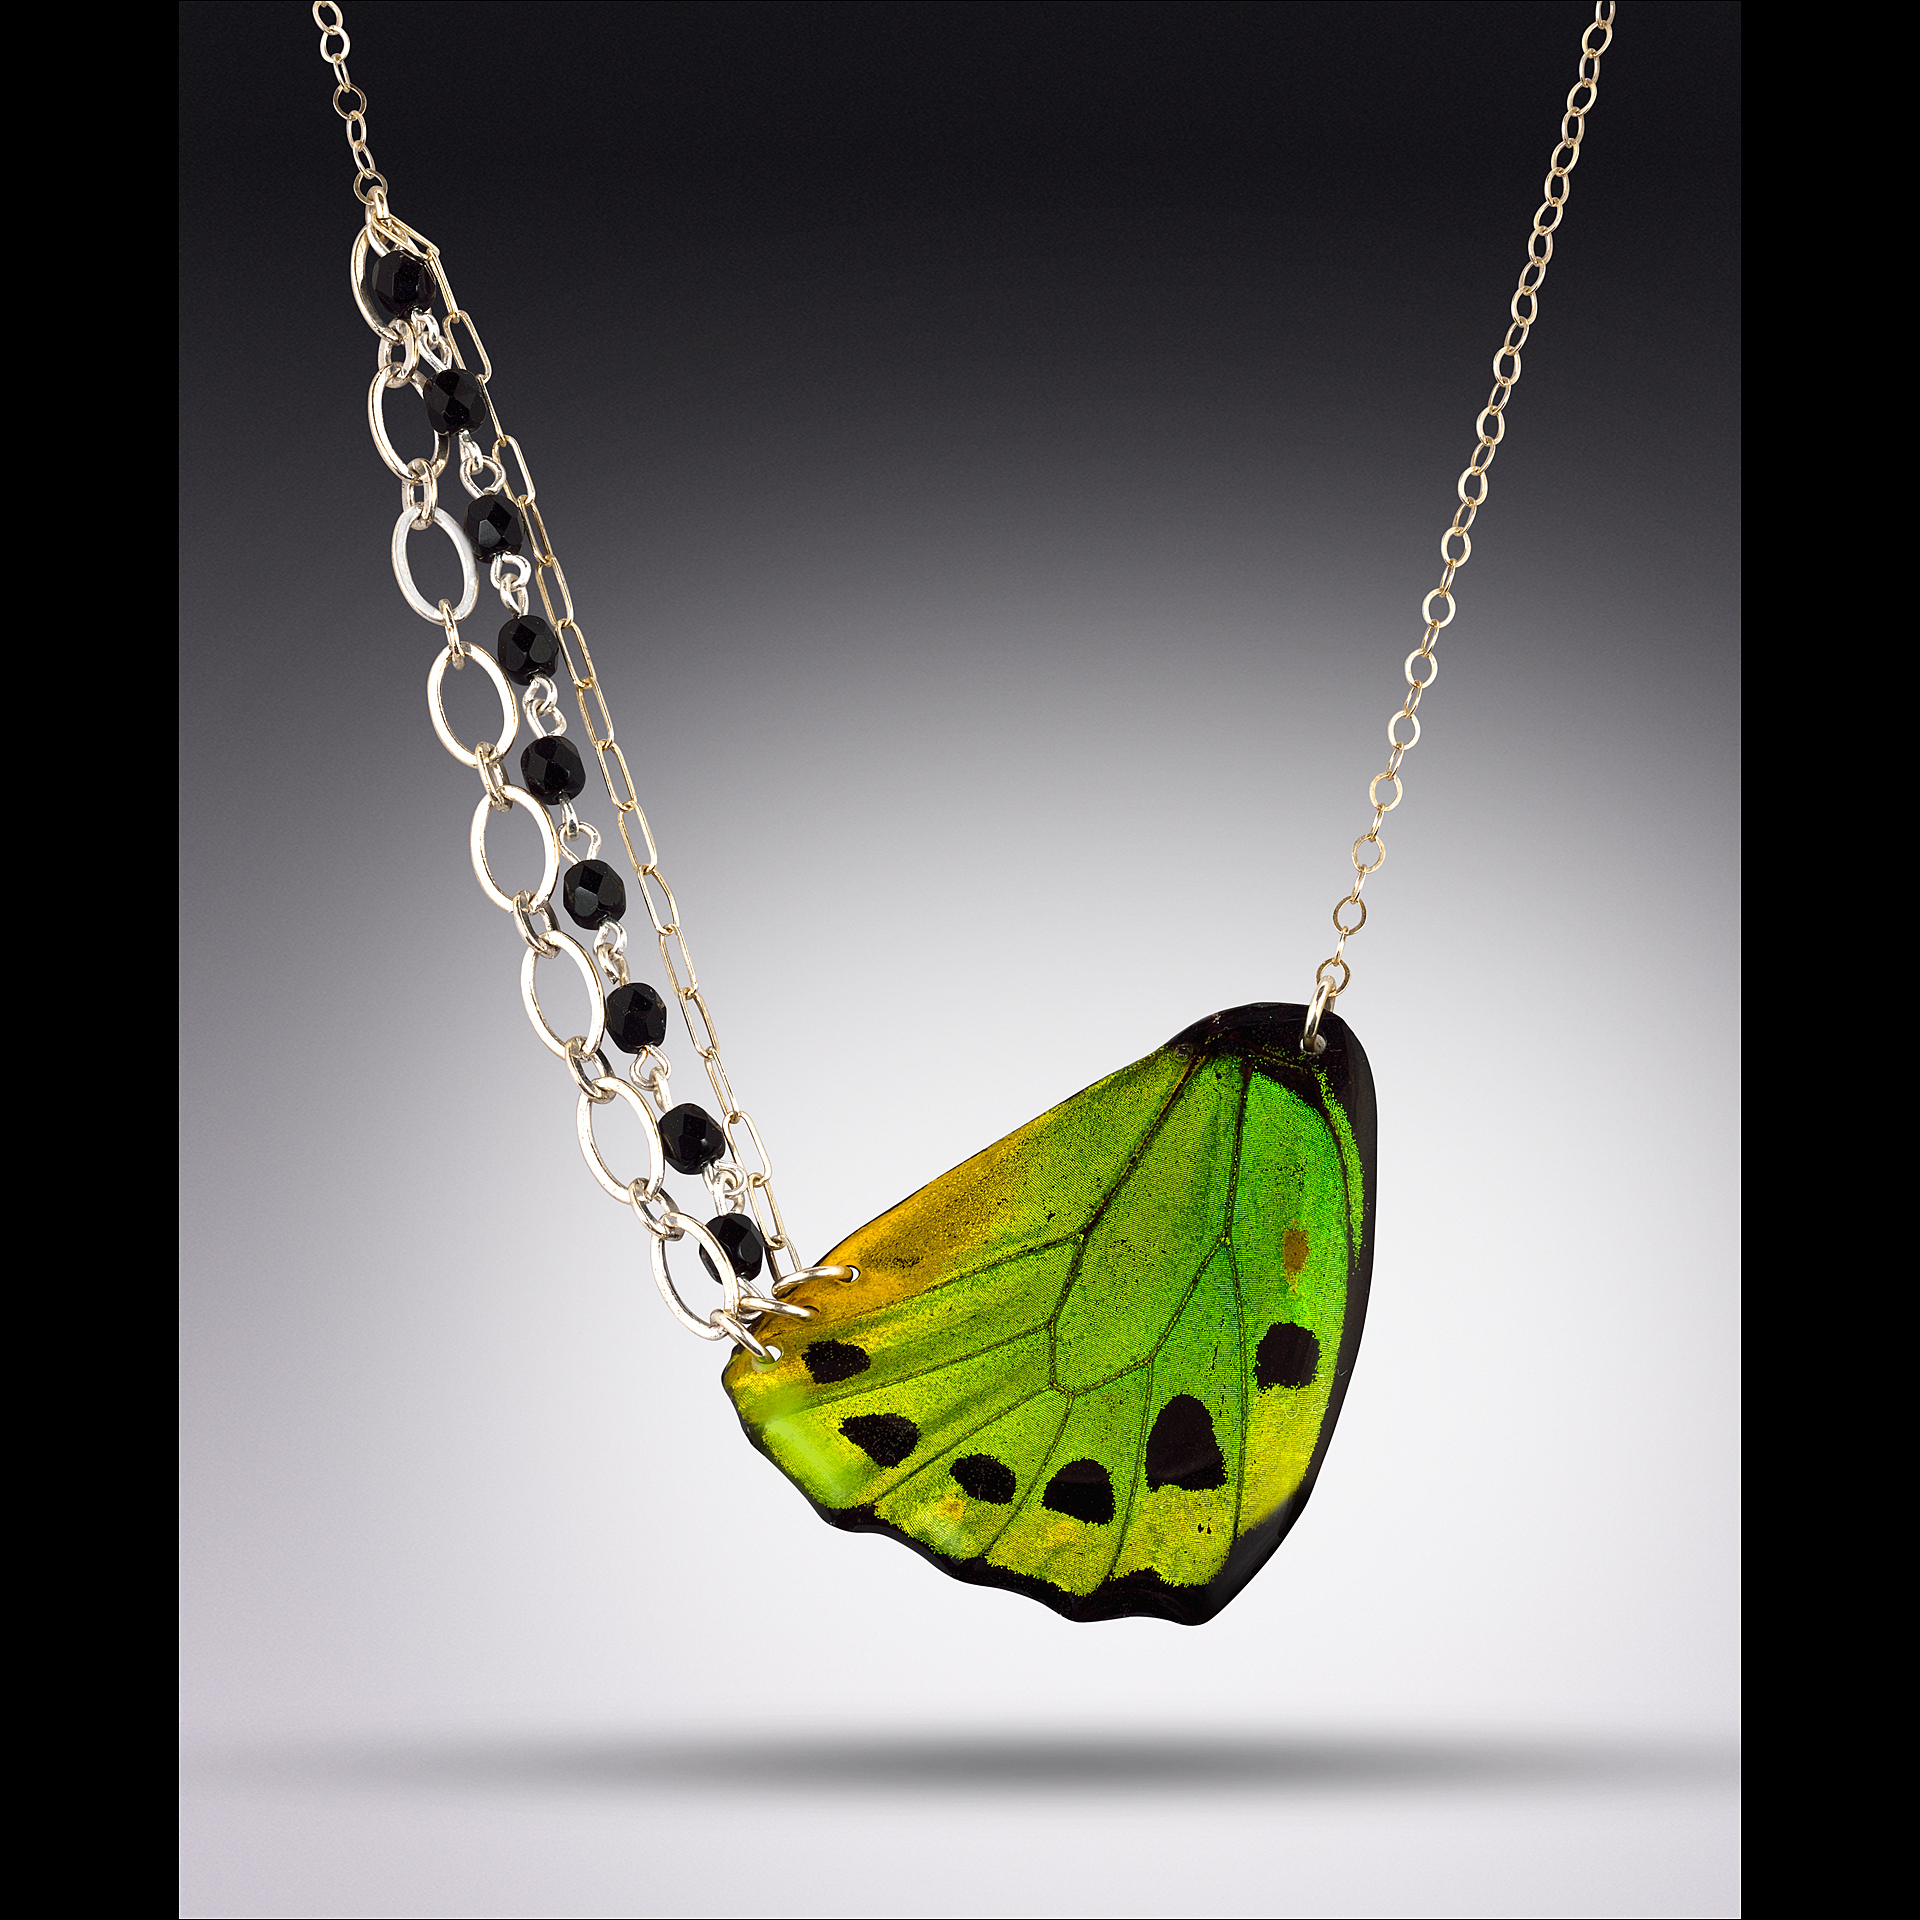 Holly Ulm -Jewelry